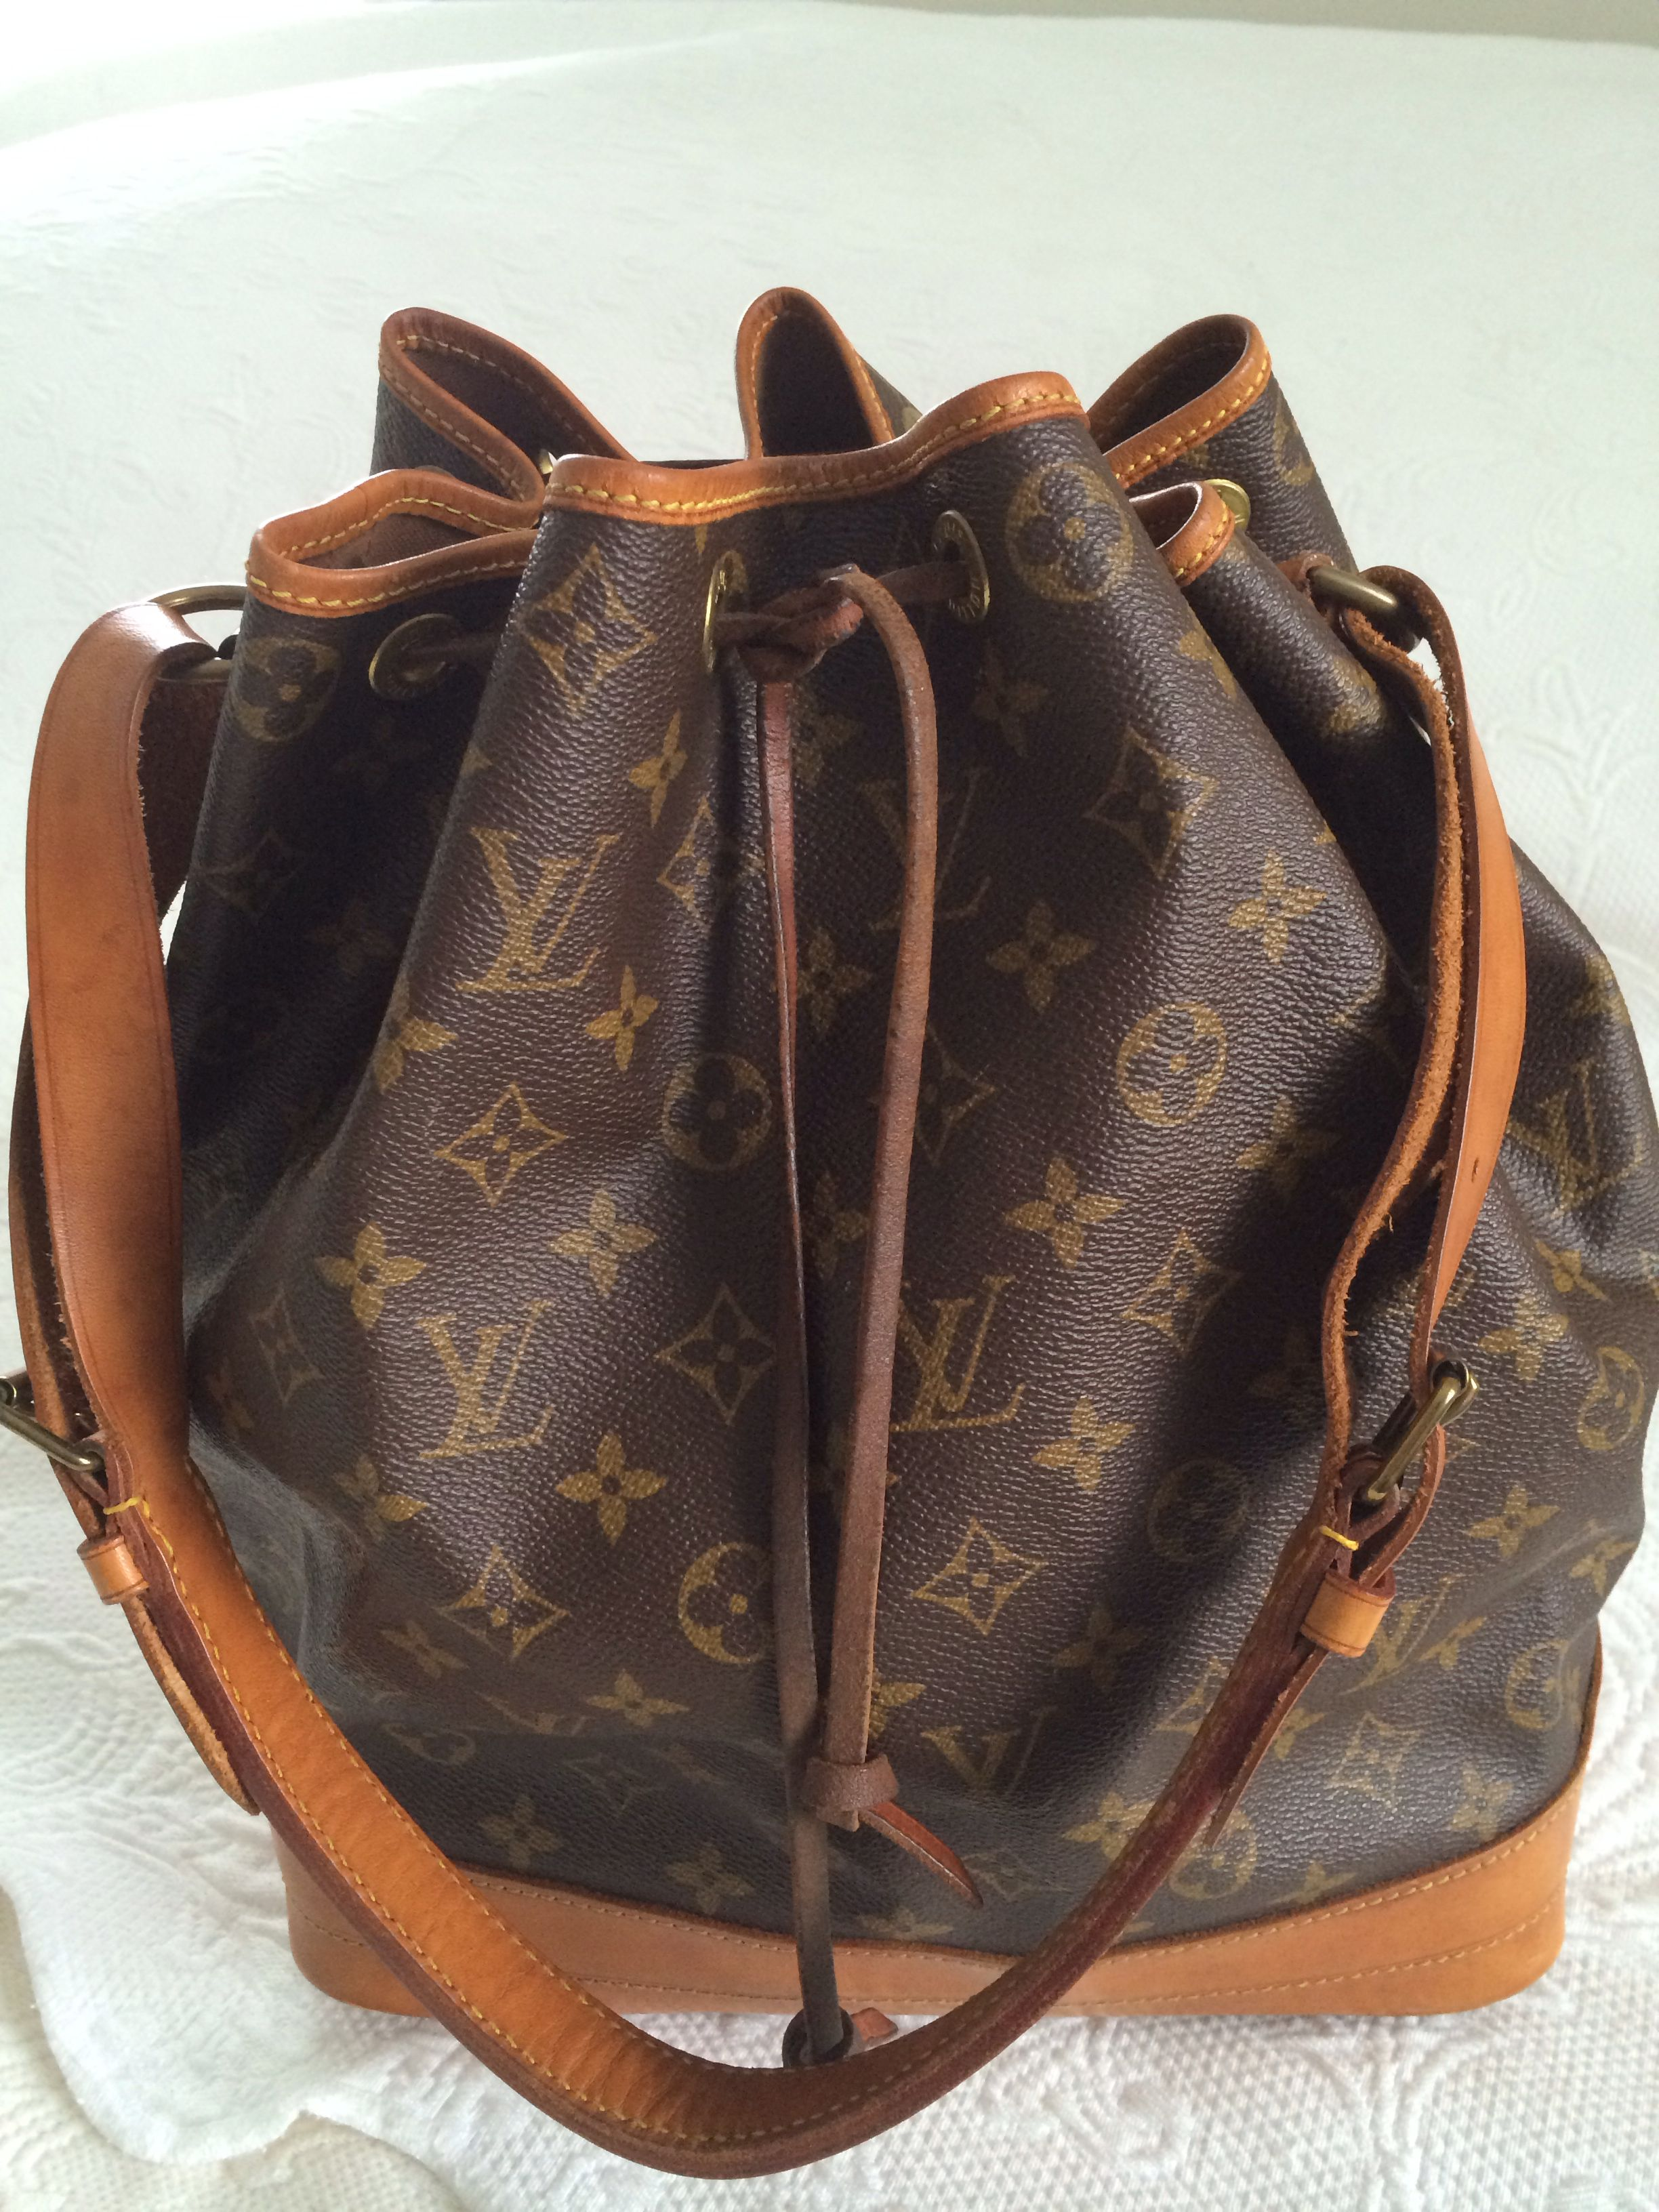 Vintage Lv Malletier Noe Louis Vuitton Collection Louis Vuitton Vintage Louis Vuitton